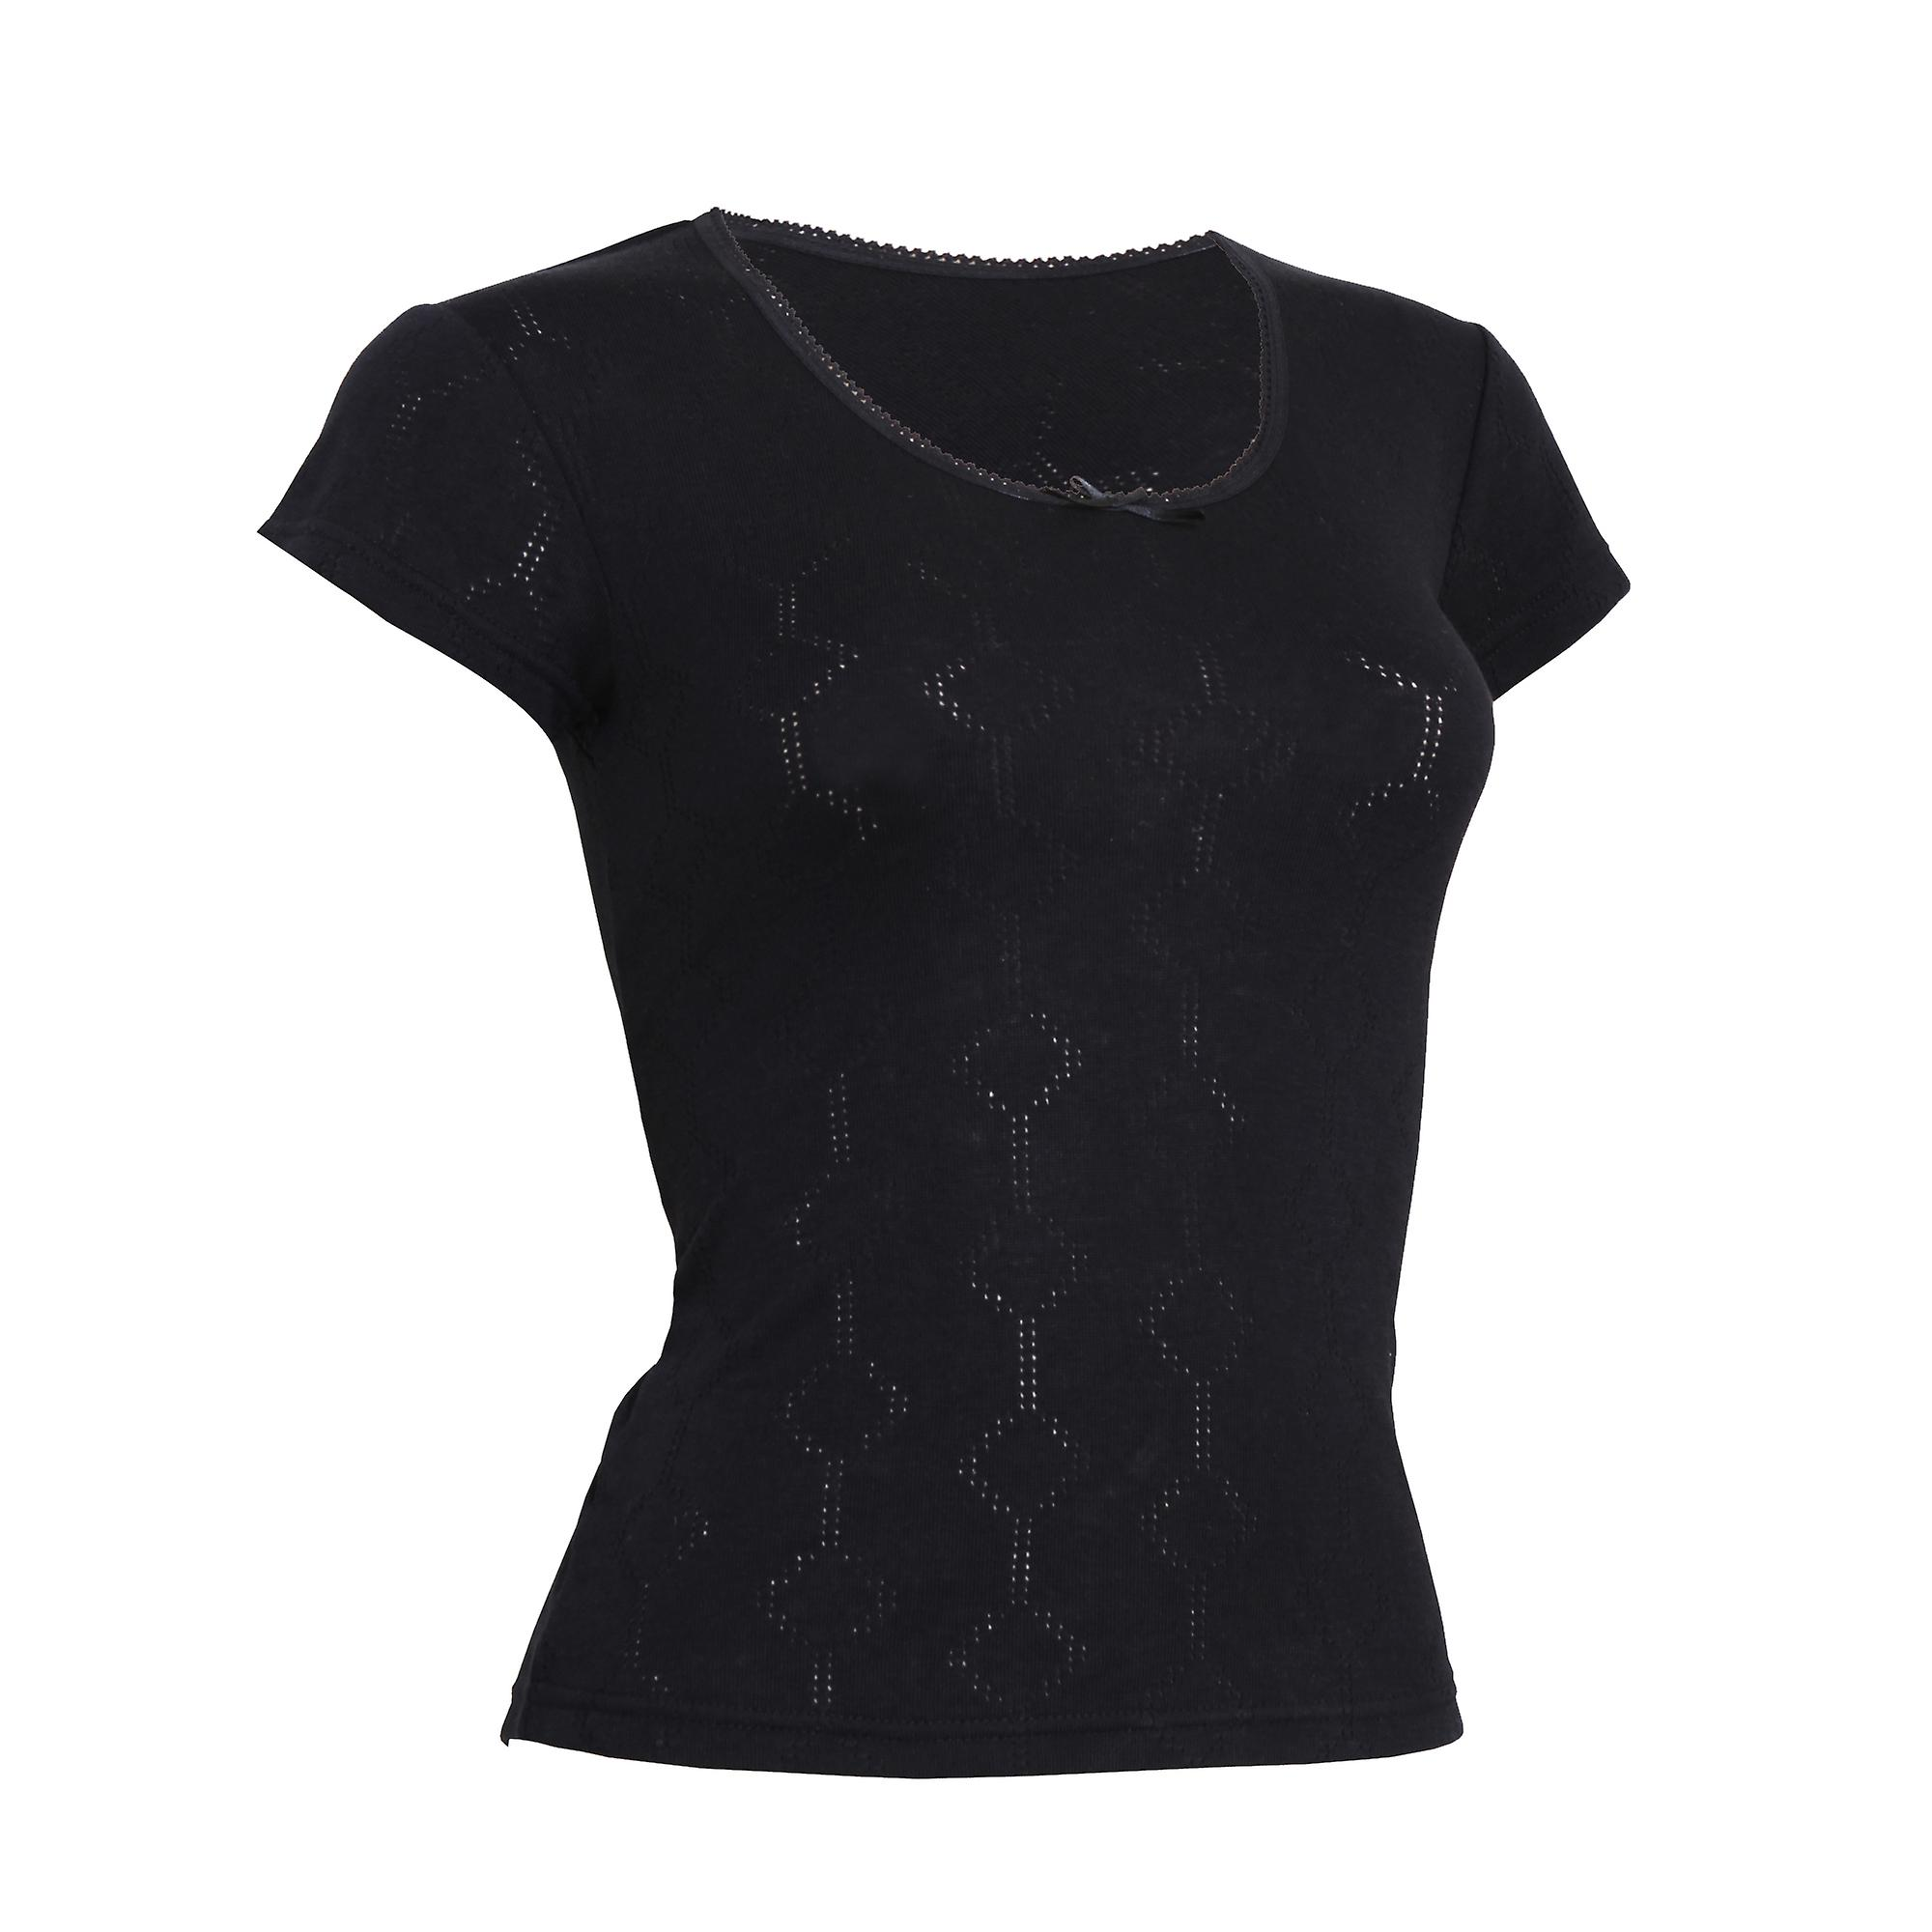 FLOSO Ladies/Womens Thermal Underwear Short Sleeve T-Shirt (Viscose Premium Range)